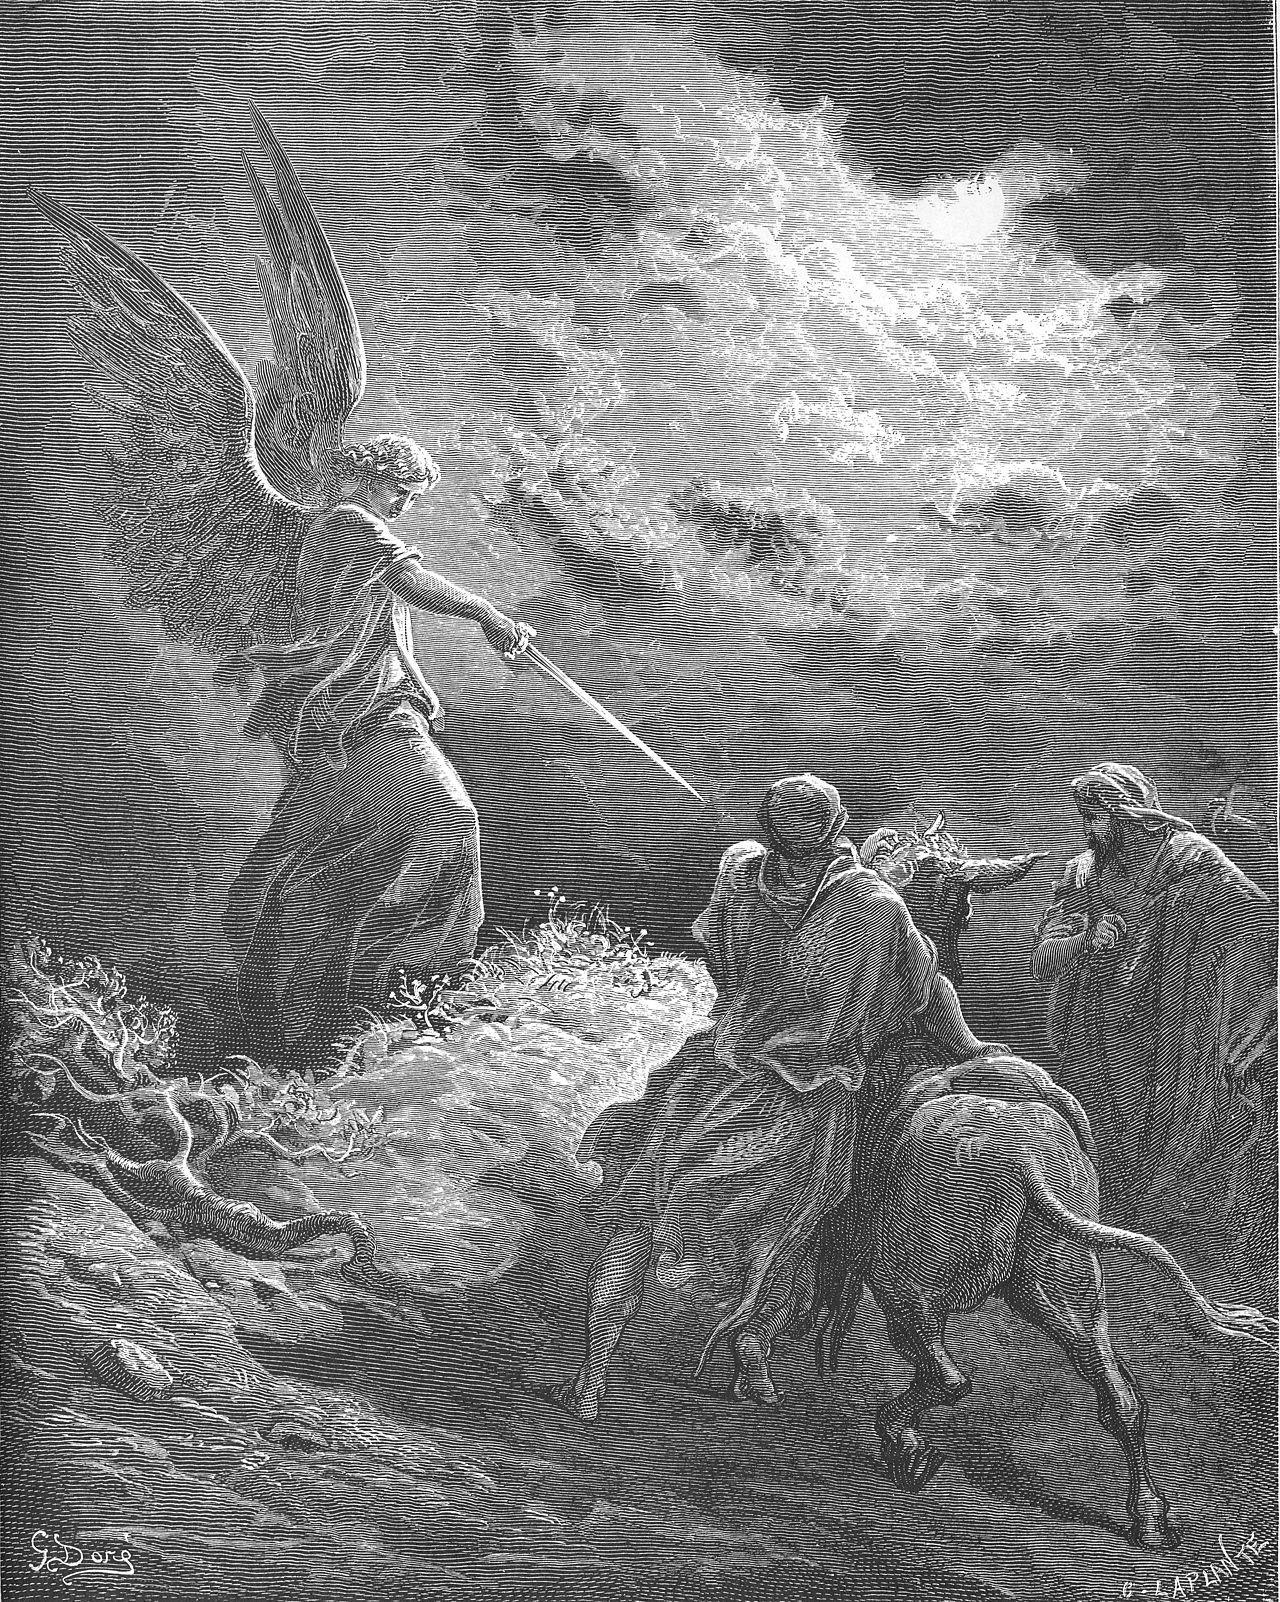 ADAM /& EVE CAST OUT OF GARDEN OF EDEN ENGRAVING BIBLE DORE ART REAL CANVAS PRINT